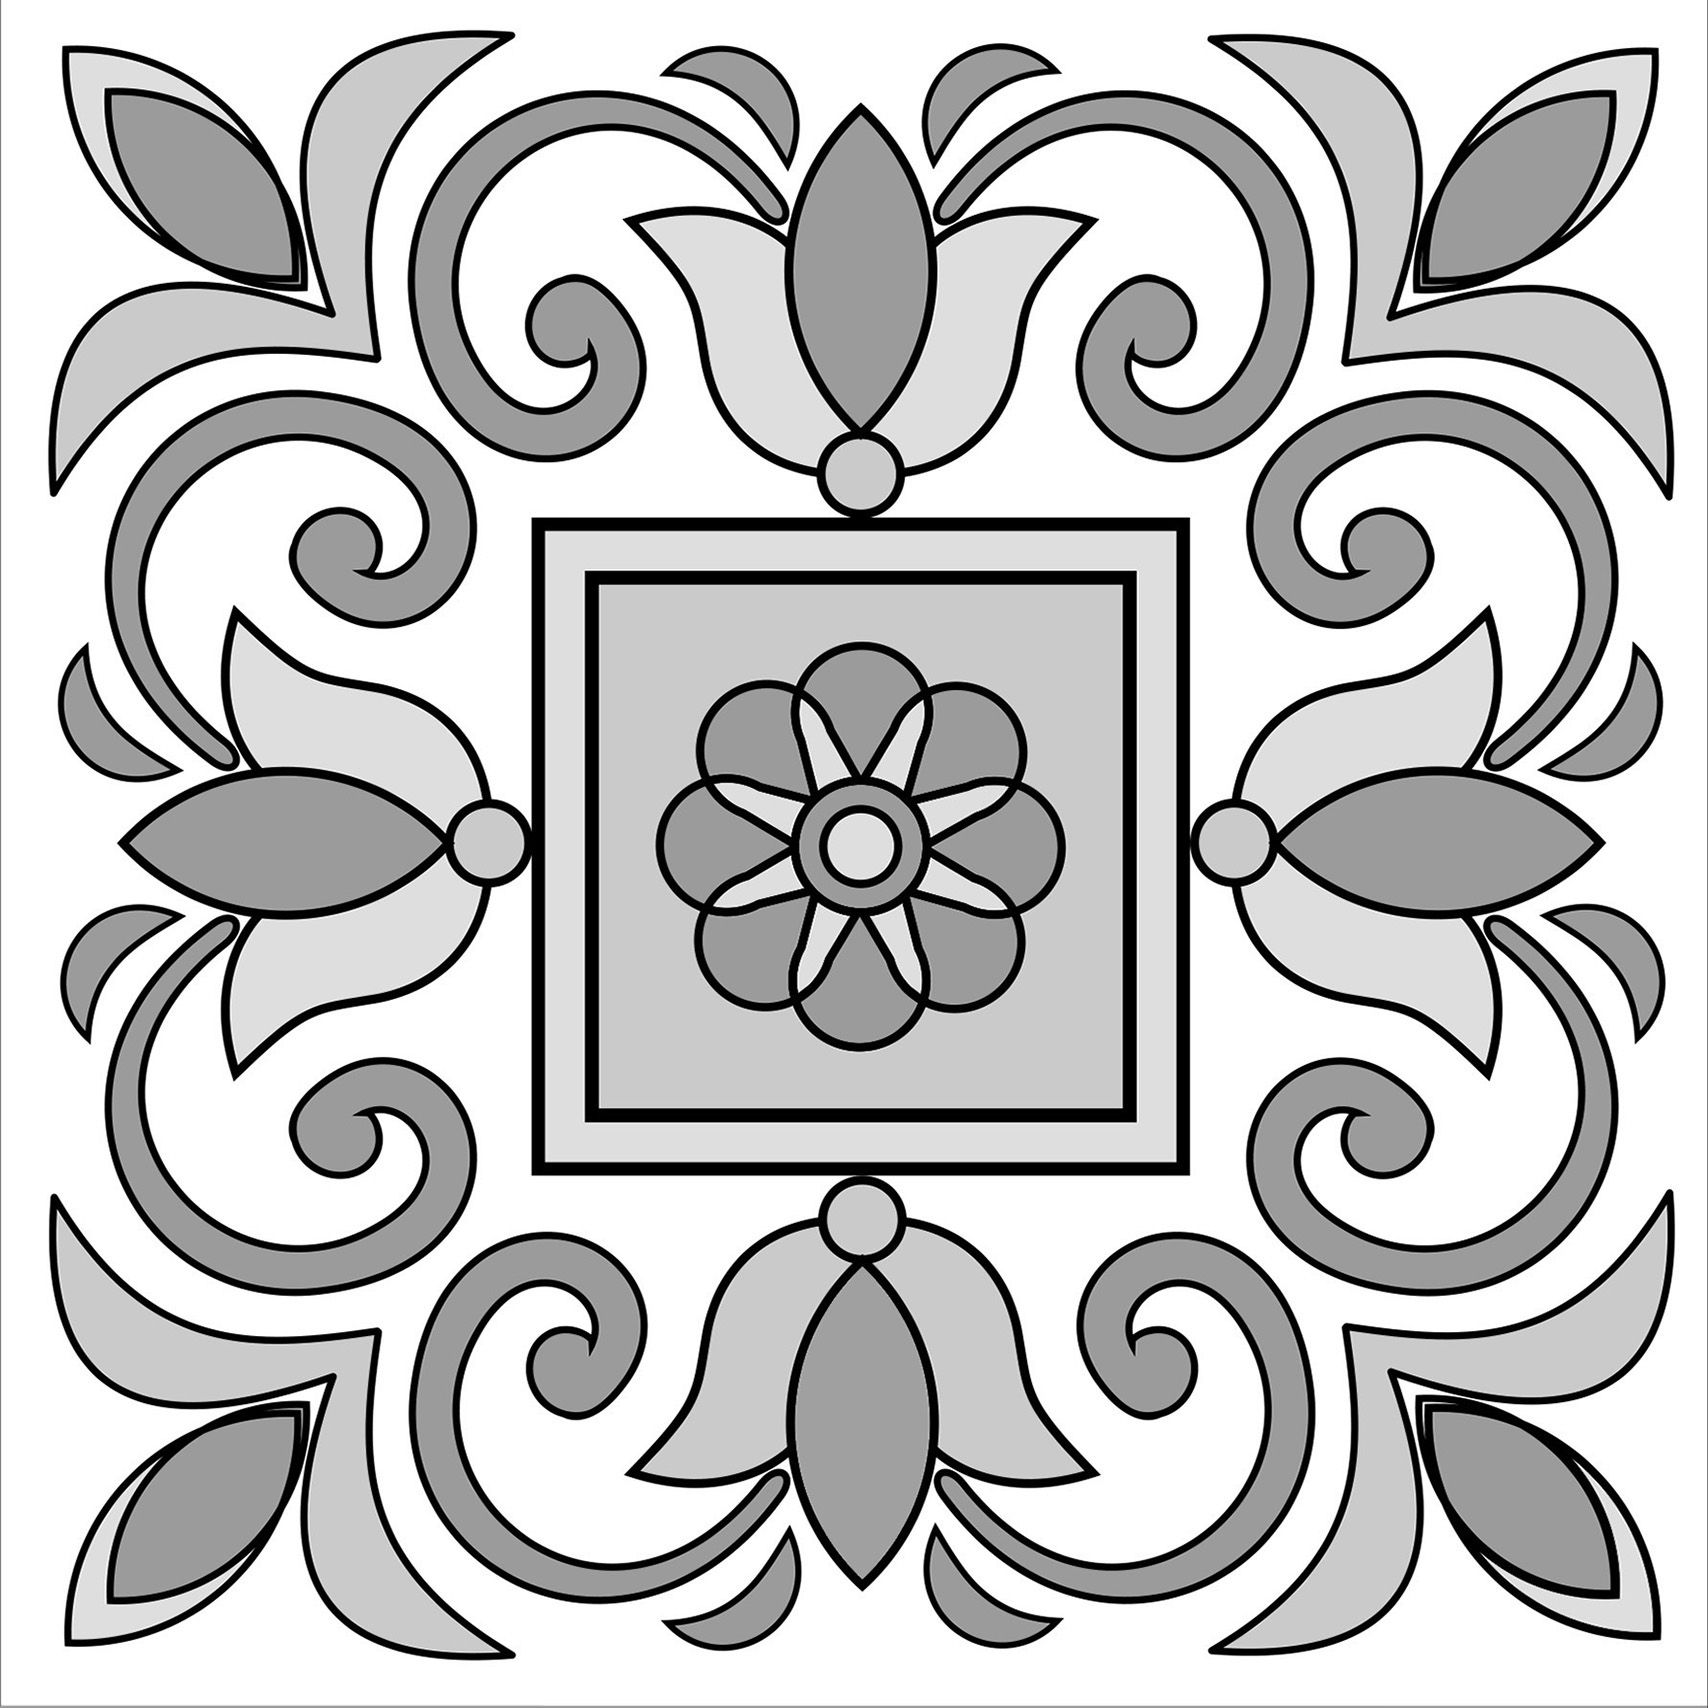 1711 7 seville tile styled seville tiles style tile Marmoleum Kitchen Floor 1711 7 seville